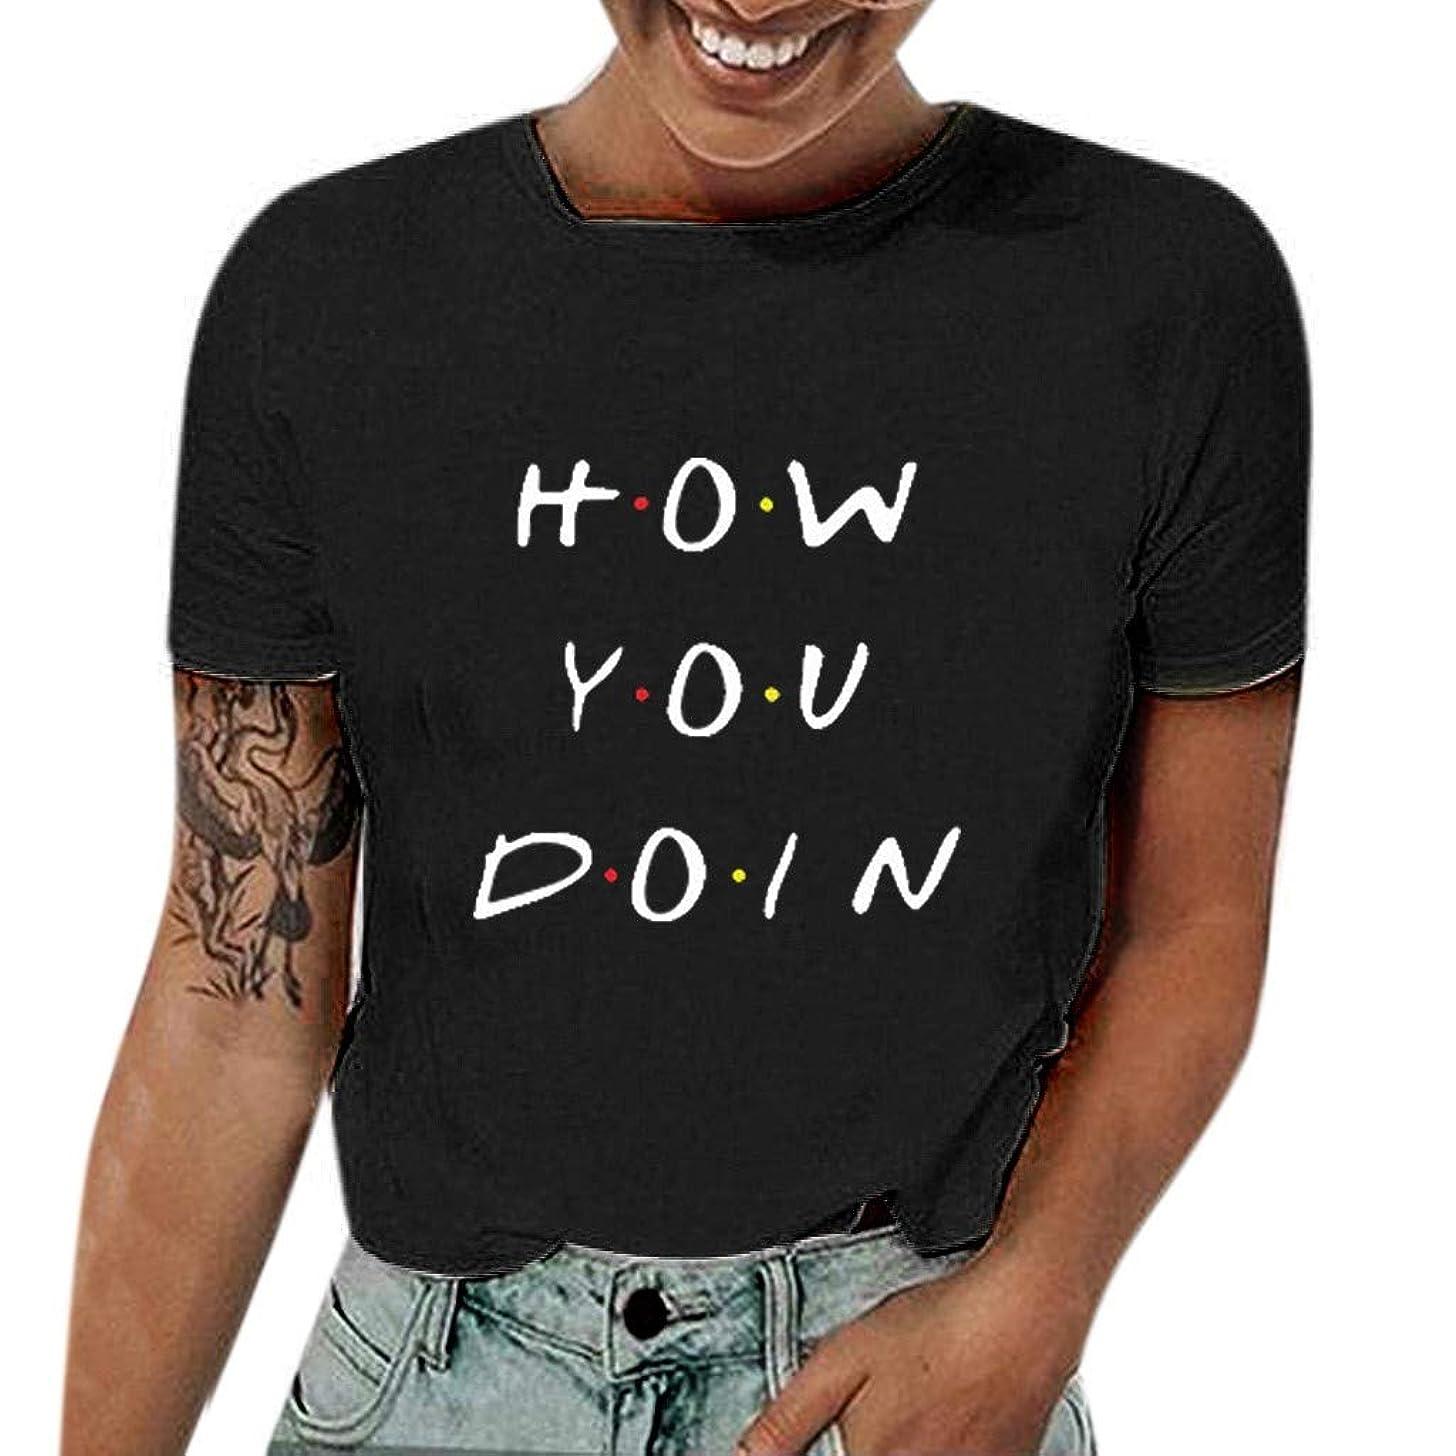 HimTak Women's t-Shirt Summer How You Doin Letter Print Top o-Leather Casual Short-Sleeve Joker Pullover